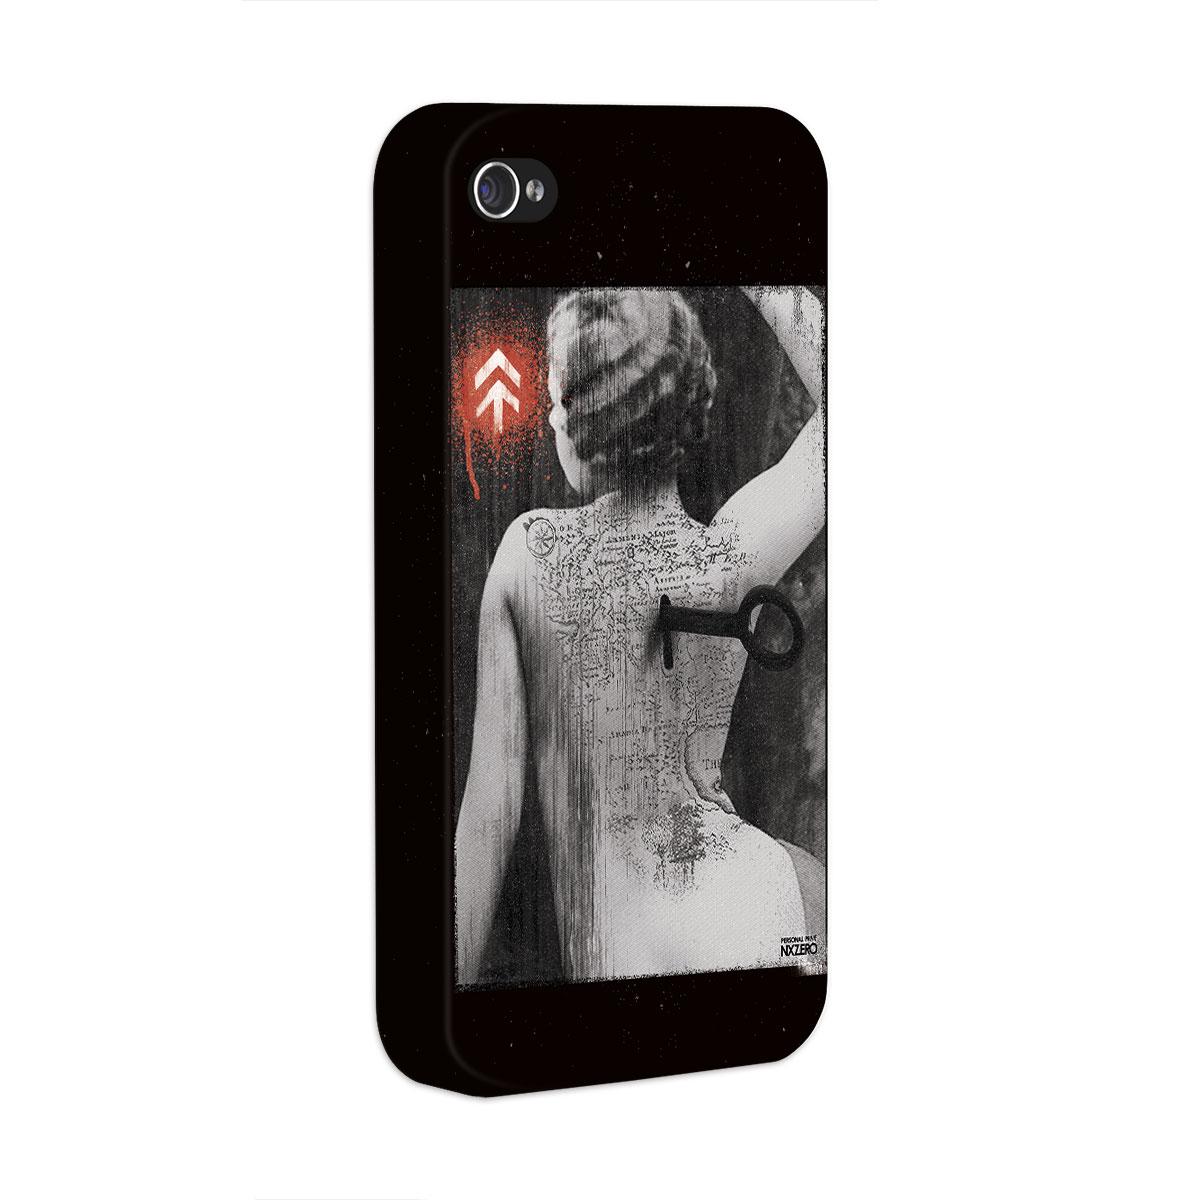 Capa para iPhone 4/4S NXZero Personal Prive